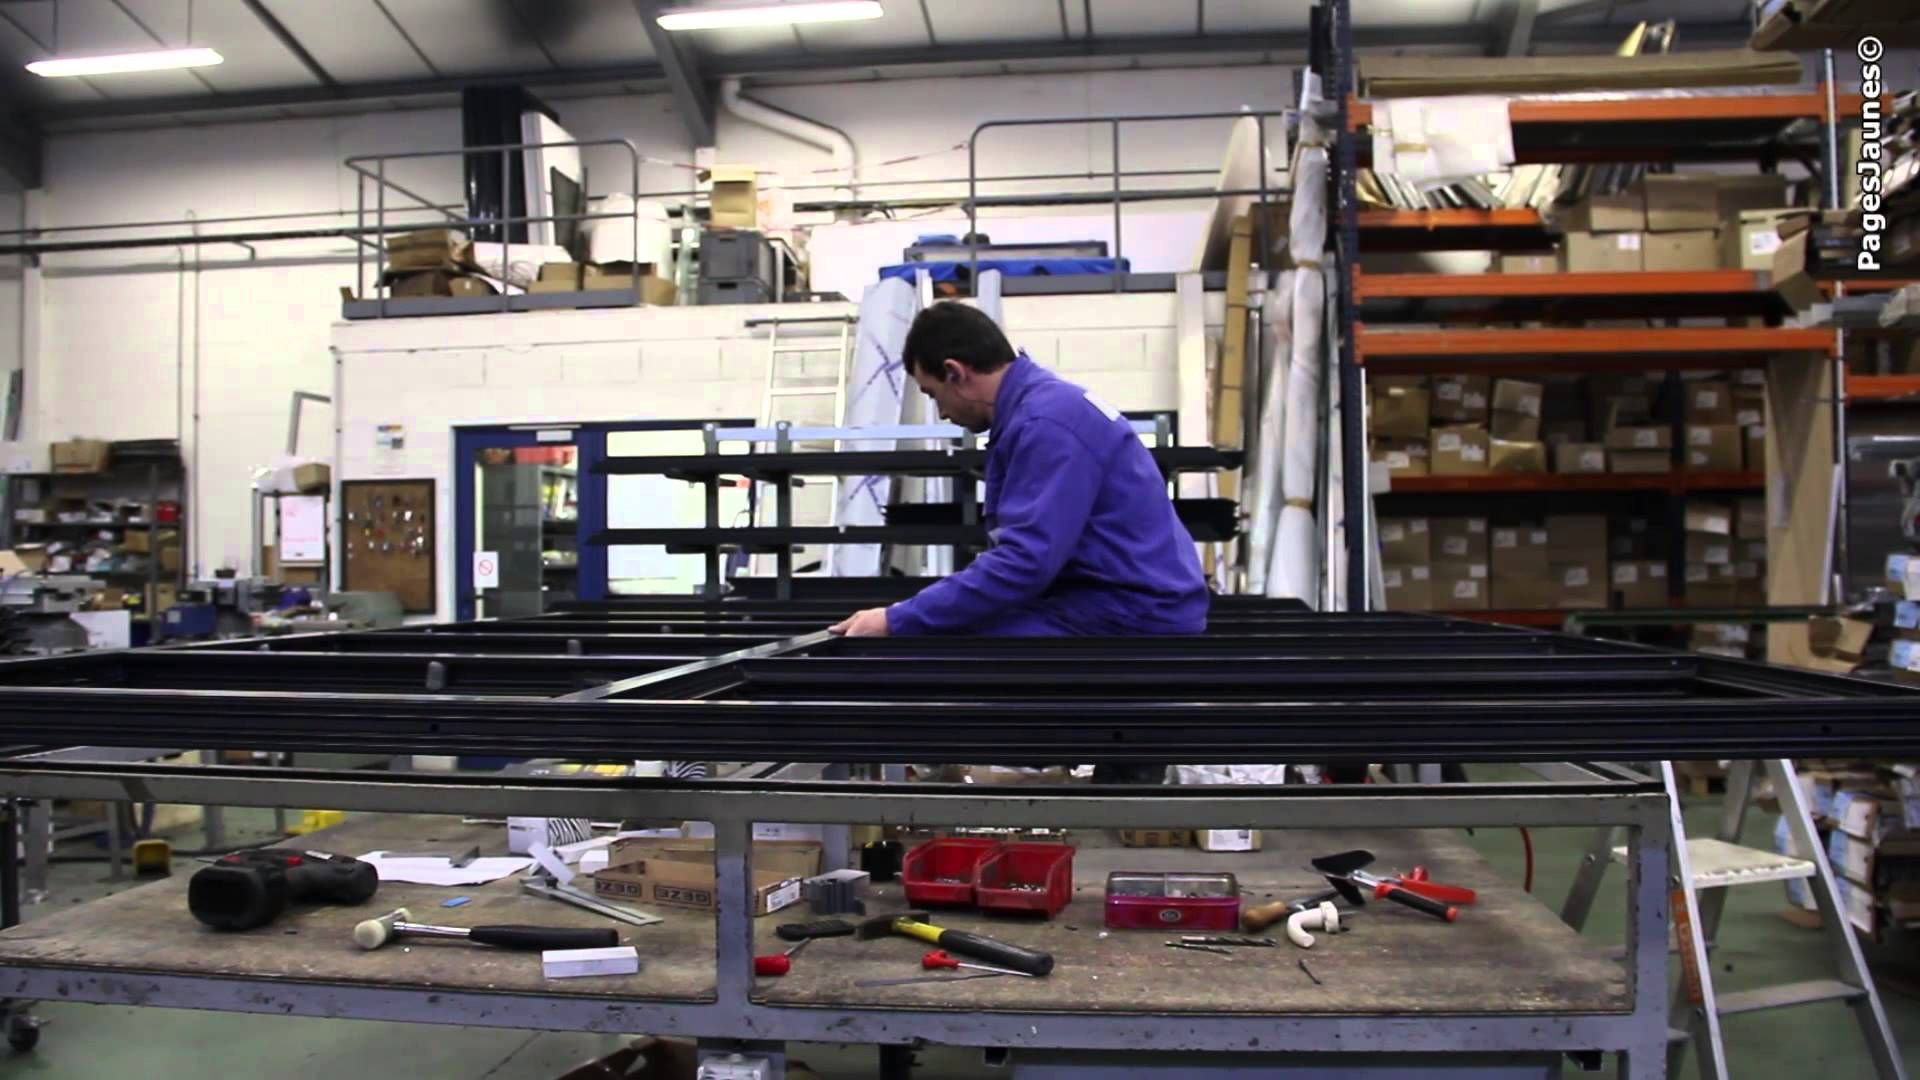 Anapec Fes Recrutement De 2 Technicien En Construction Metallique